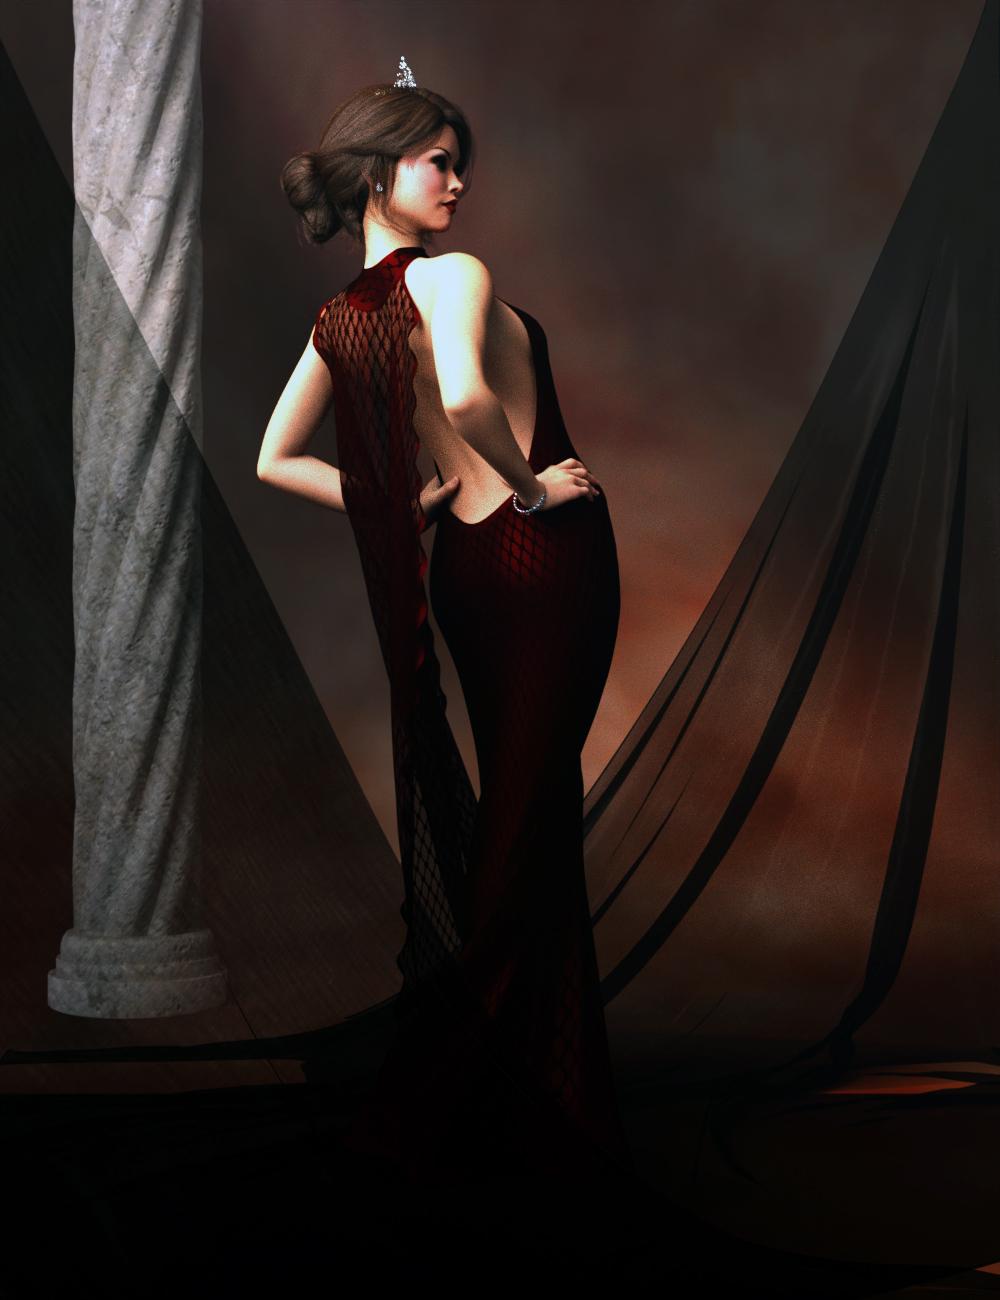 IGD Vintage Vogue Poses for Genesis 8 Female by: Islandgirl, 3D Models by Daz 3D